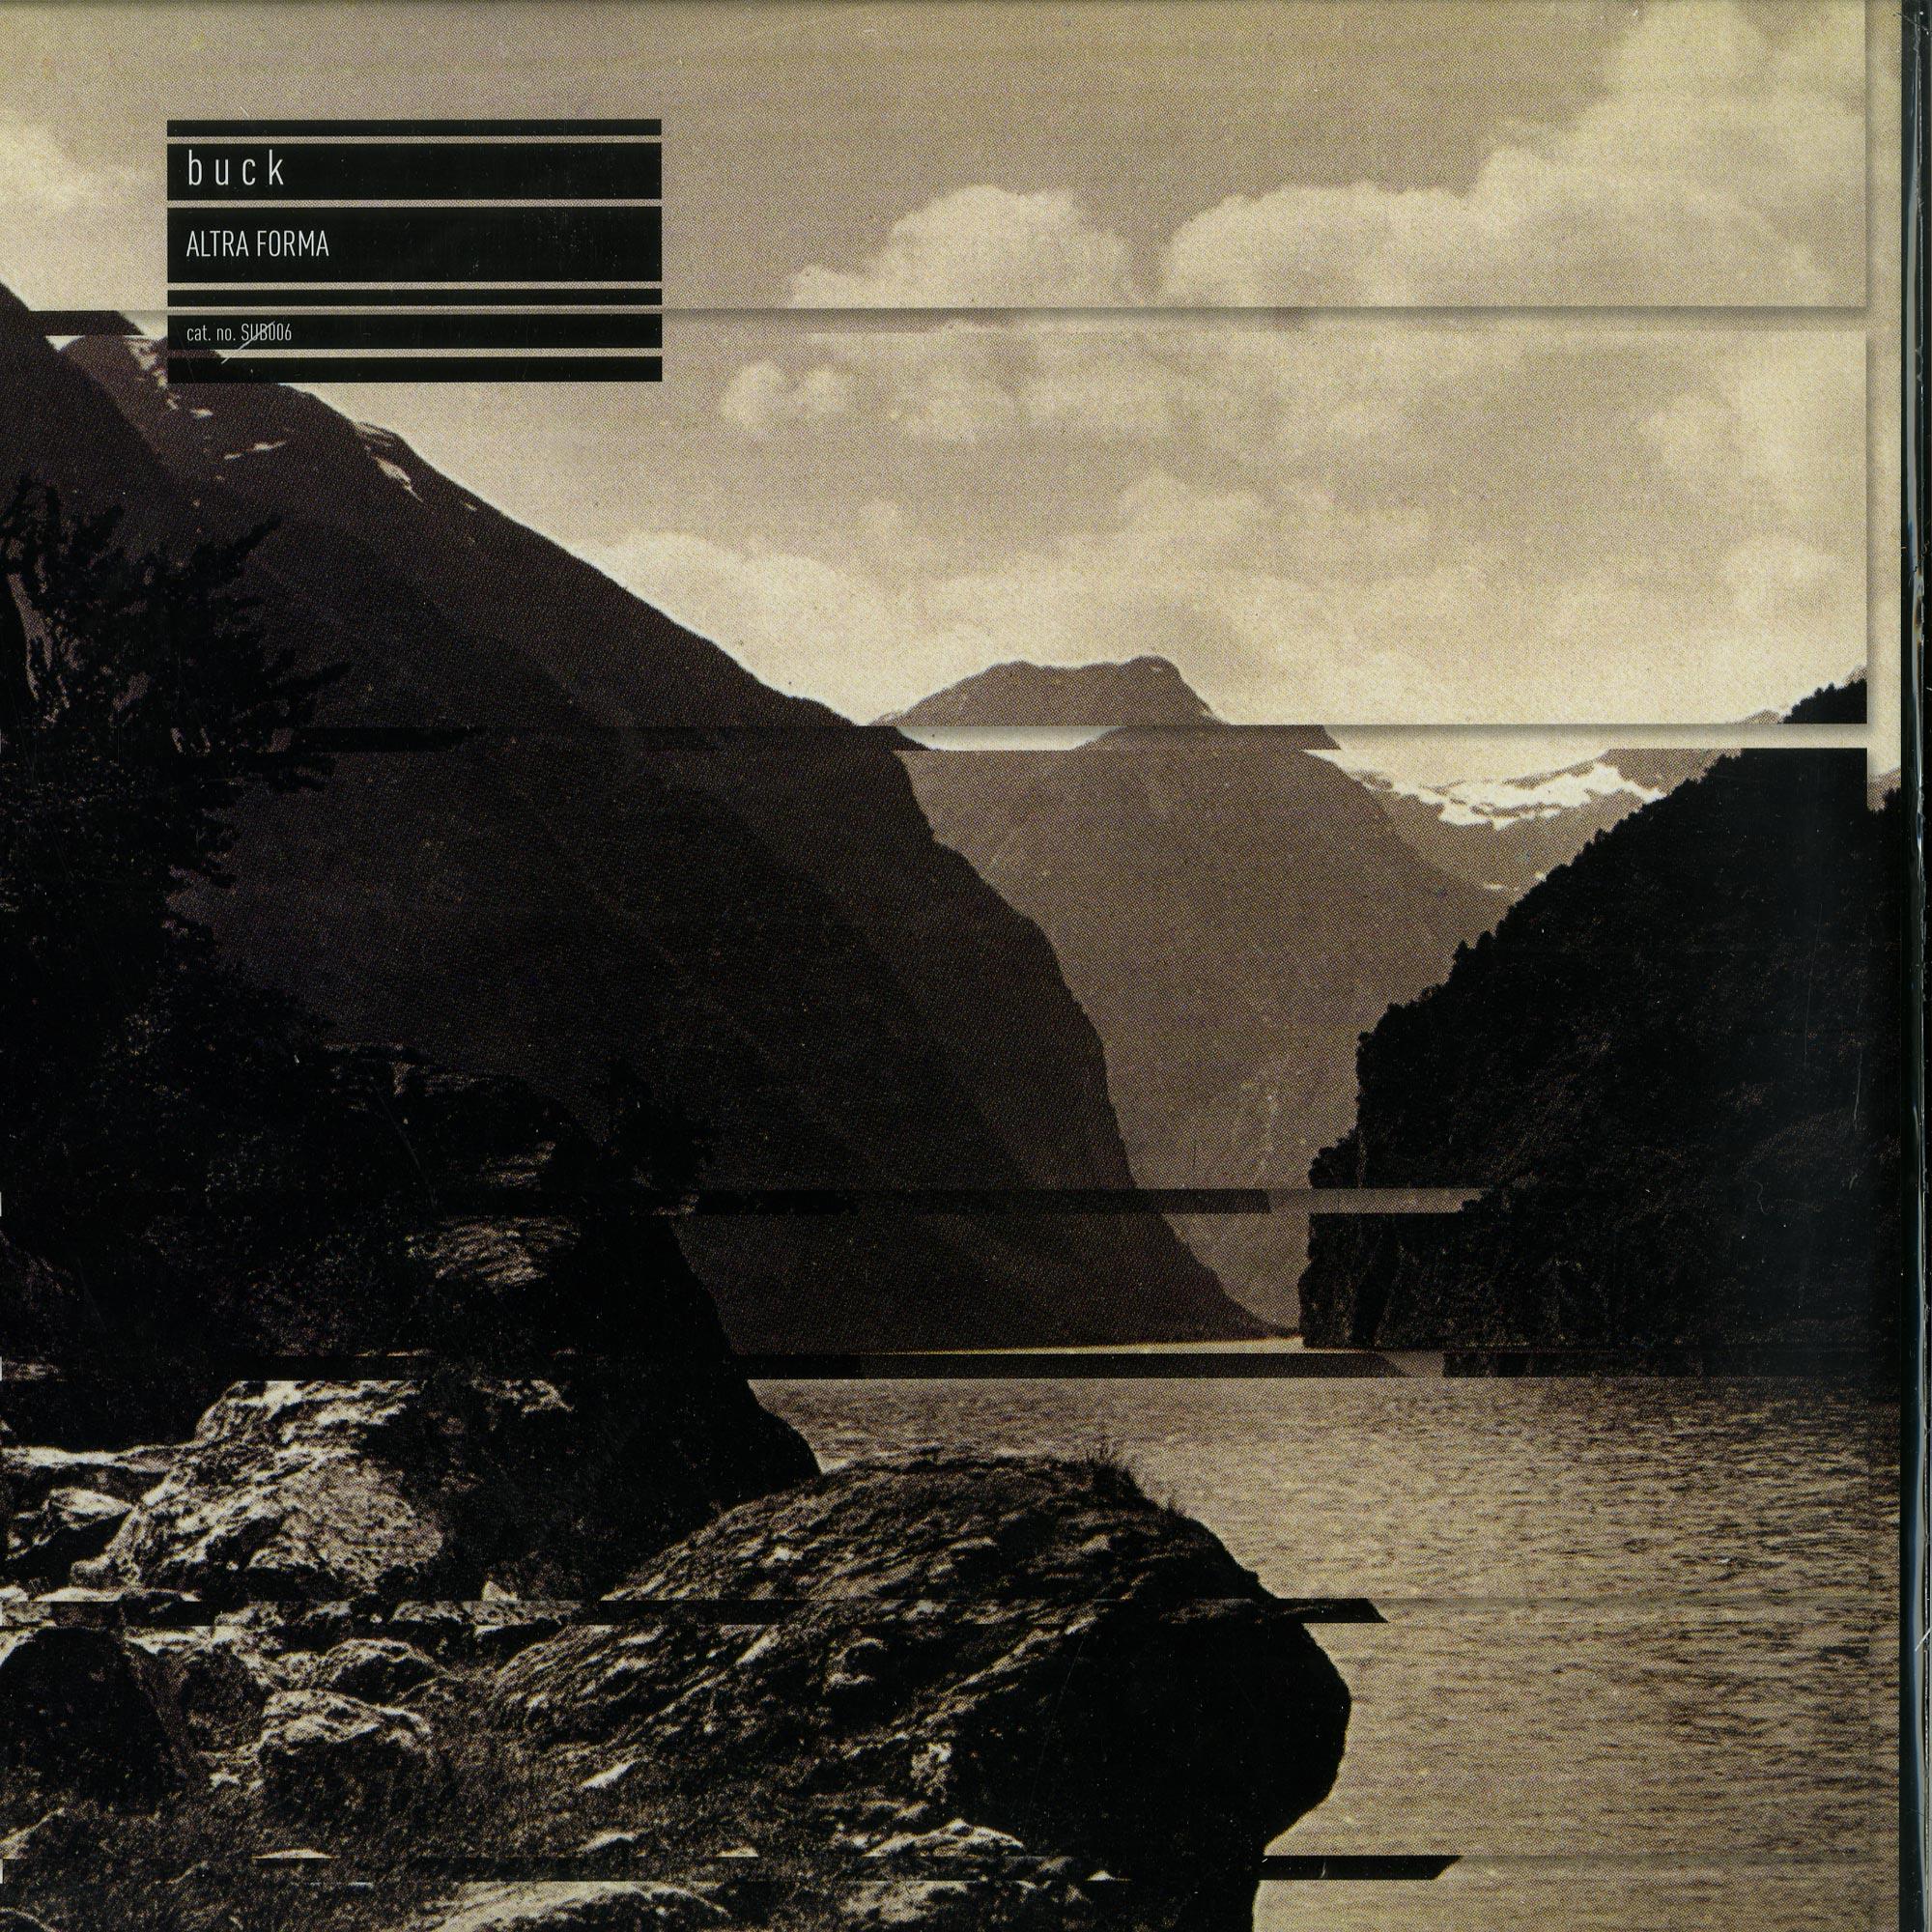 Buck - ALTRA FORMA EP